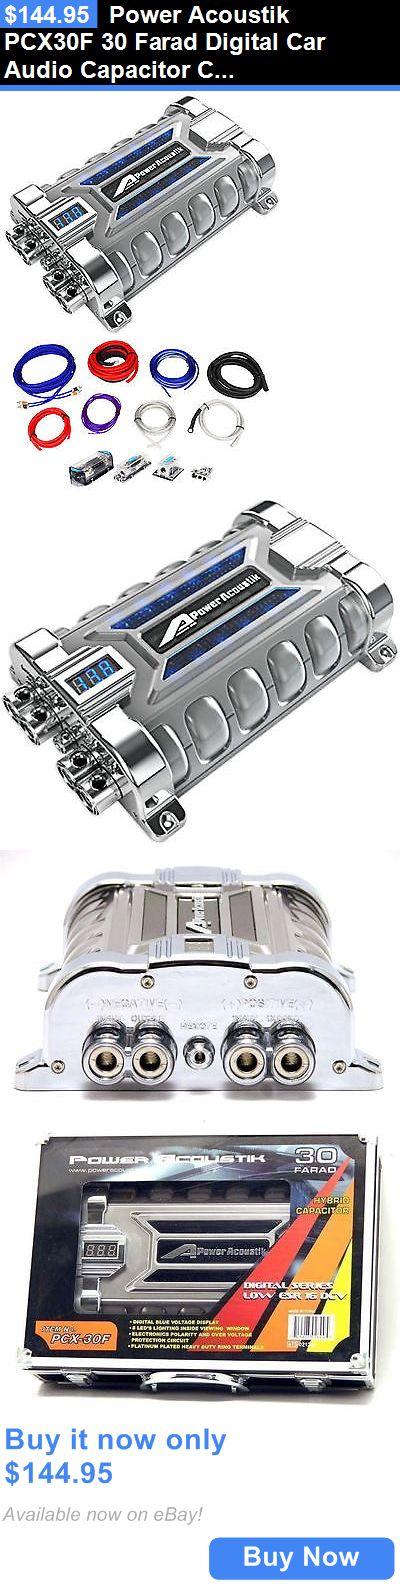 17 best ideas about car audio loudspeaker enclosure capacitors power acoustik pcx30f 30 farad digital car audio capacitor cap amp kit buy